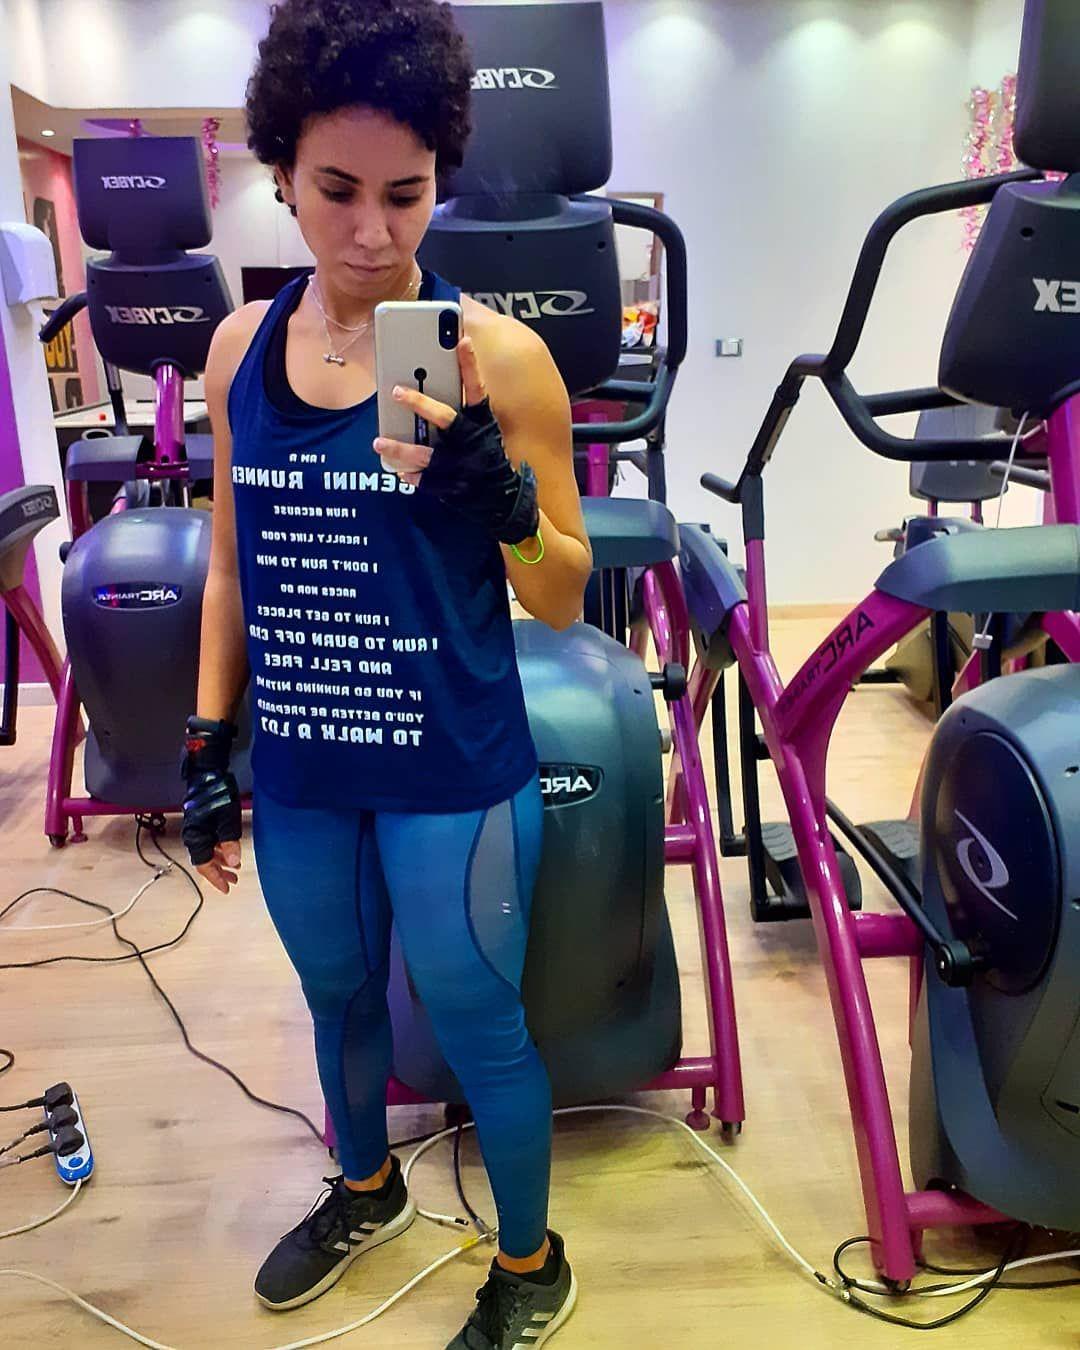 🌈🔥 #workout #lowerbody #motivation #fitnessmodel #fitgirl #curly #fitnessmotivation #fitness #leanmu...